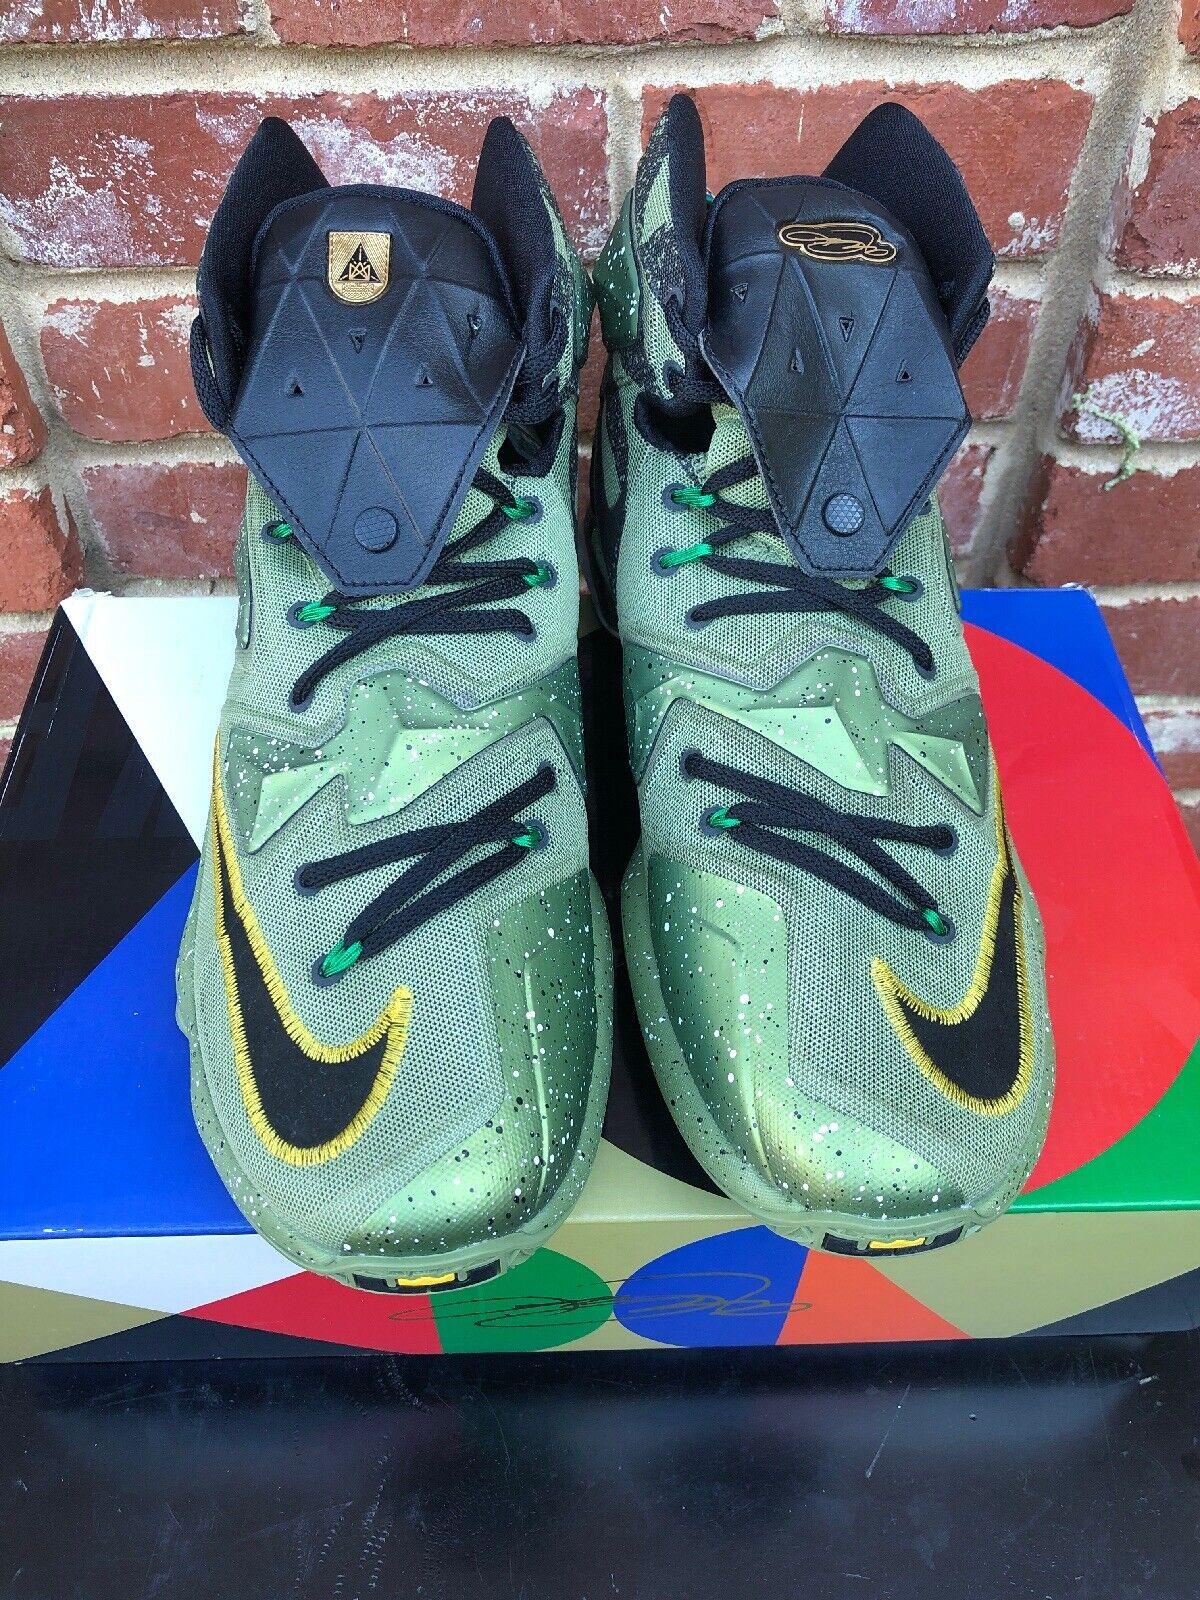 compra nuovo economico Nike Lebron XIII AS Allstar, Men's